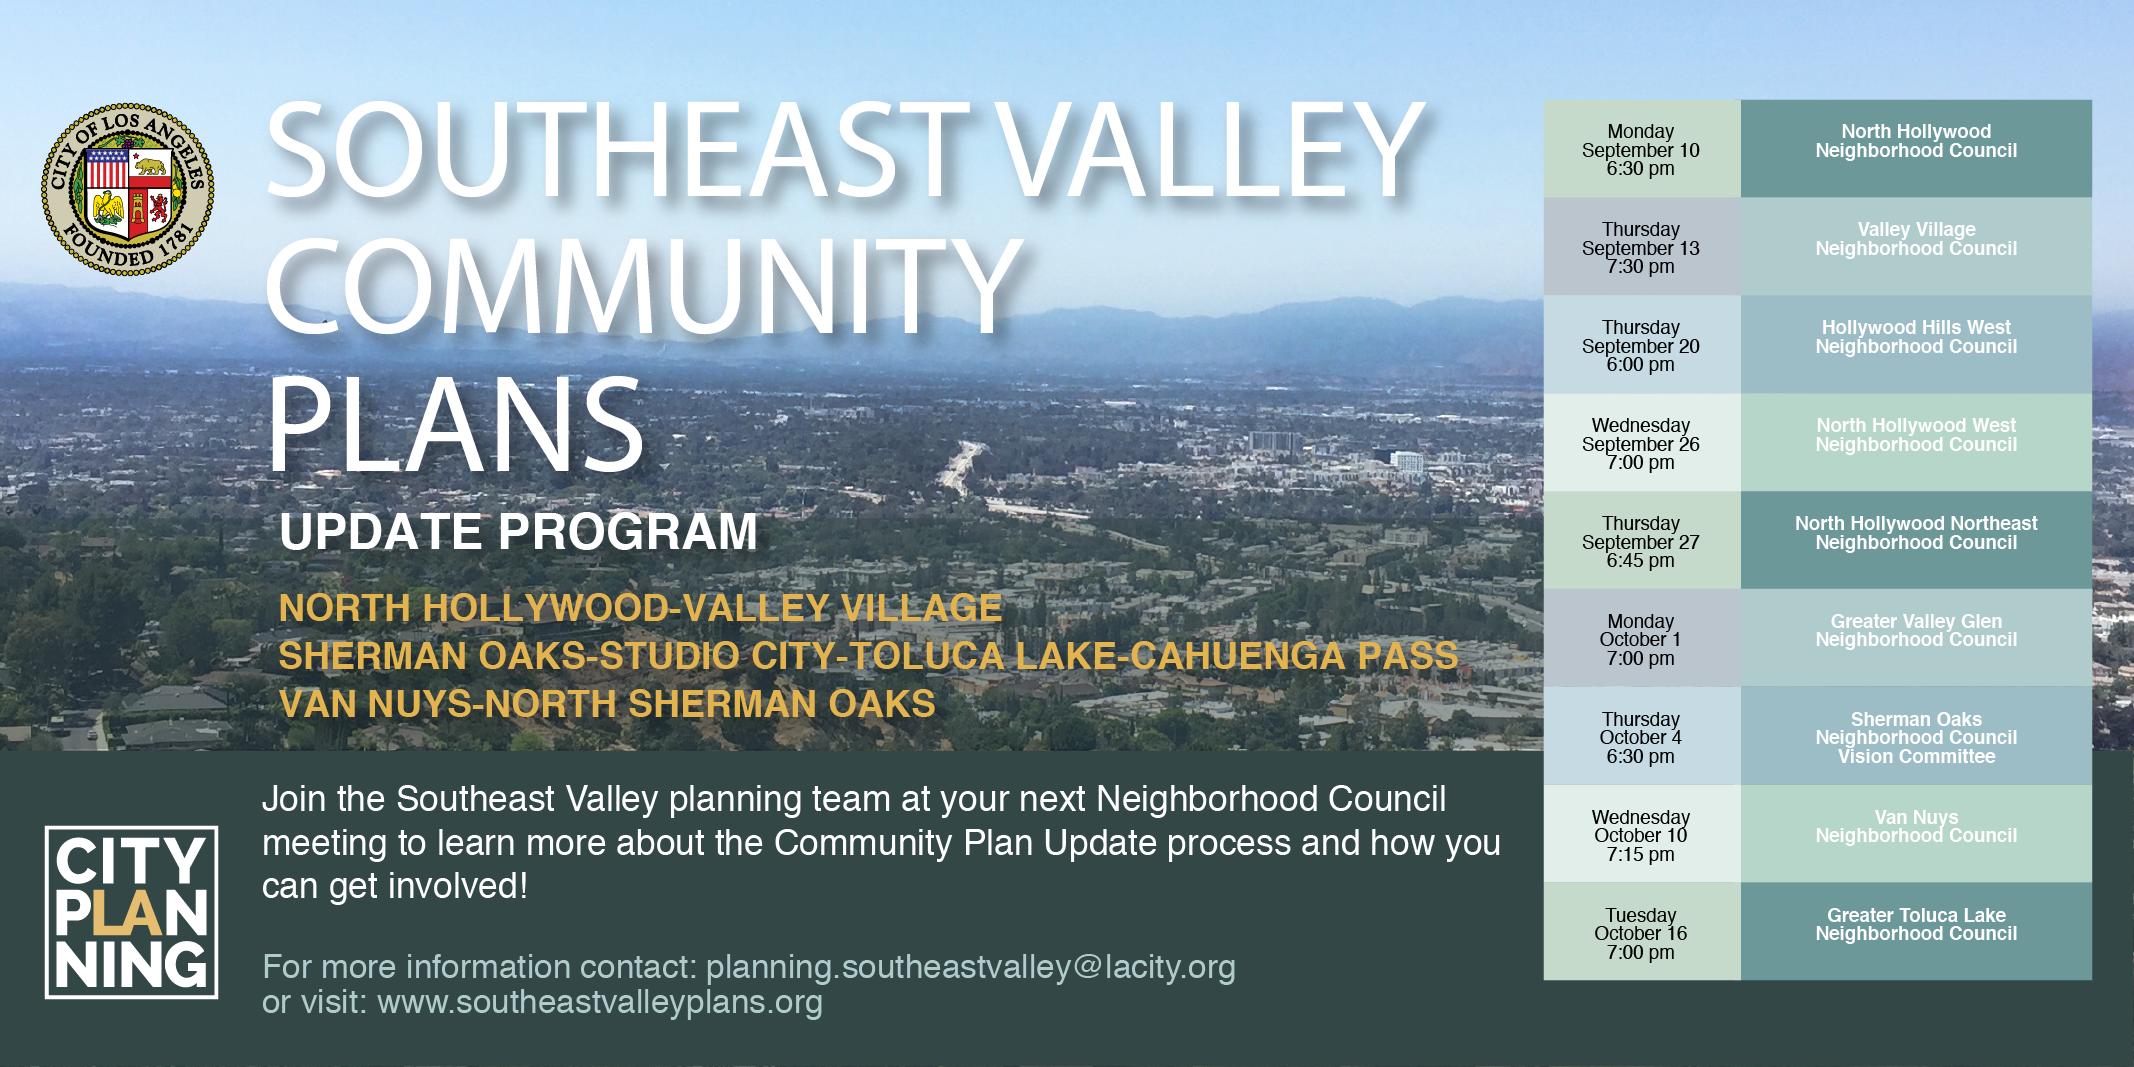 Southeast Valley Community Plan Meetings